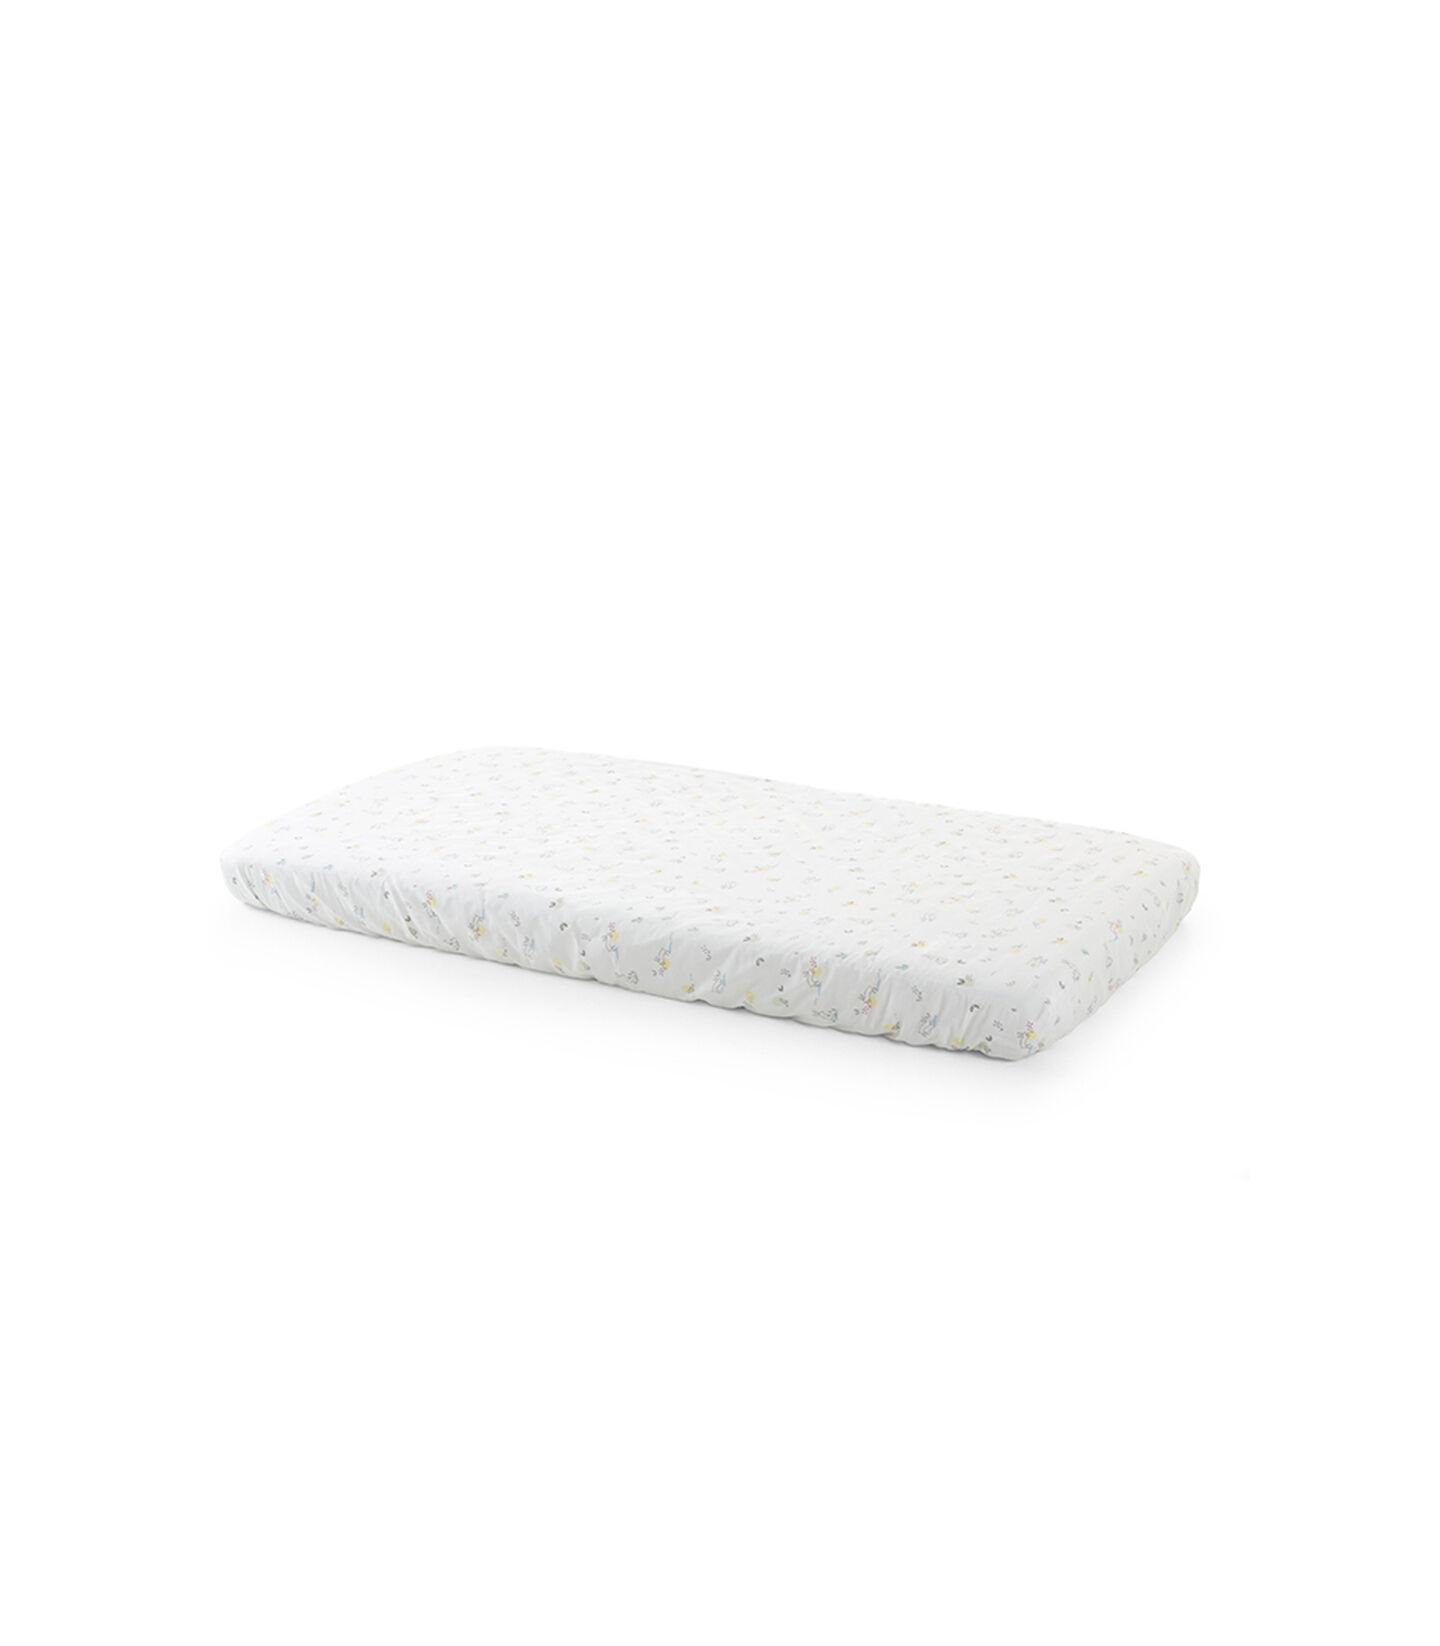 Stokke® Home™ Bed Spannbettlaken, 2-teilig - Soft Rabbit, Soft Rabbit, mainview view 1